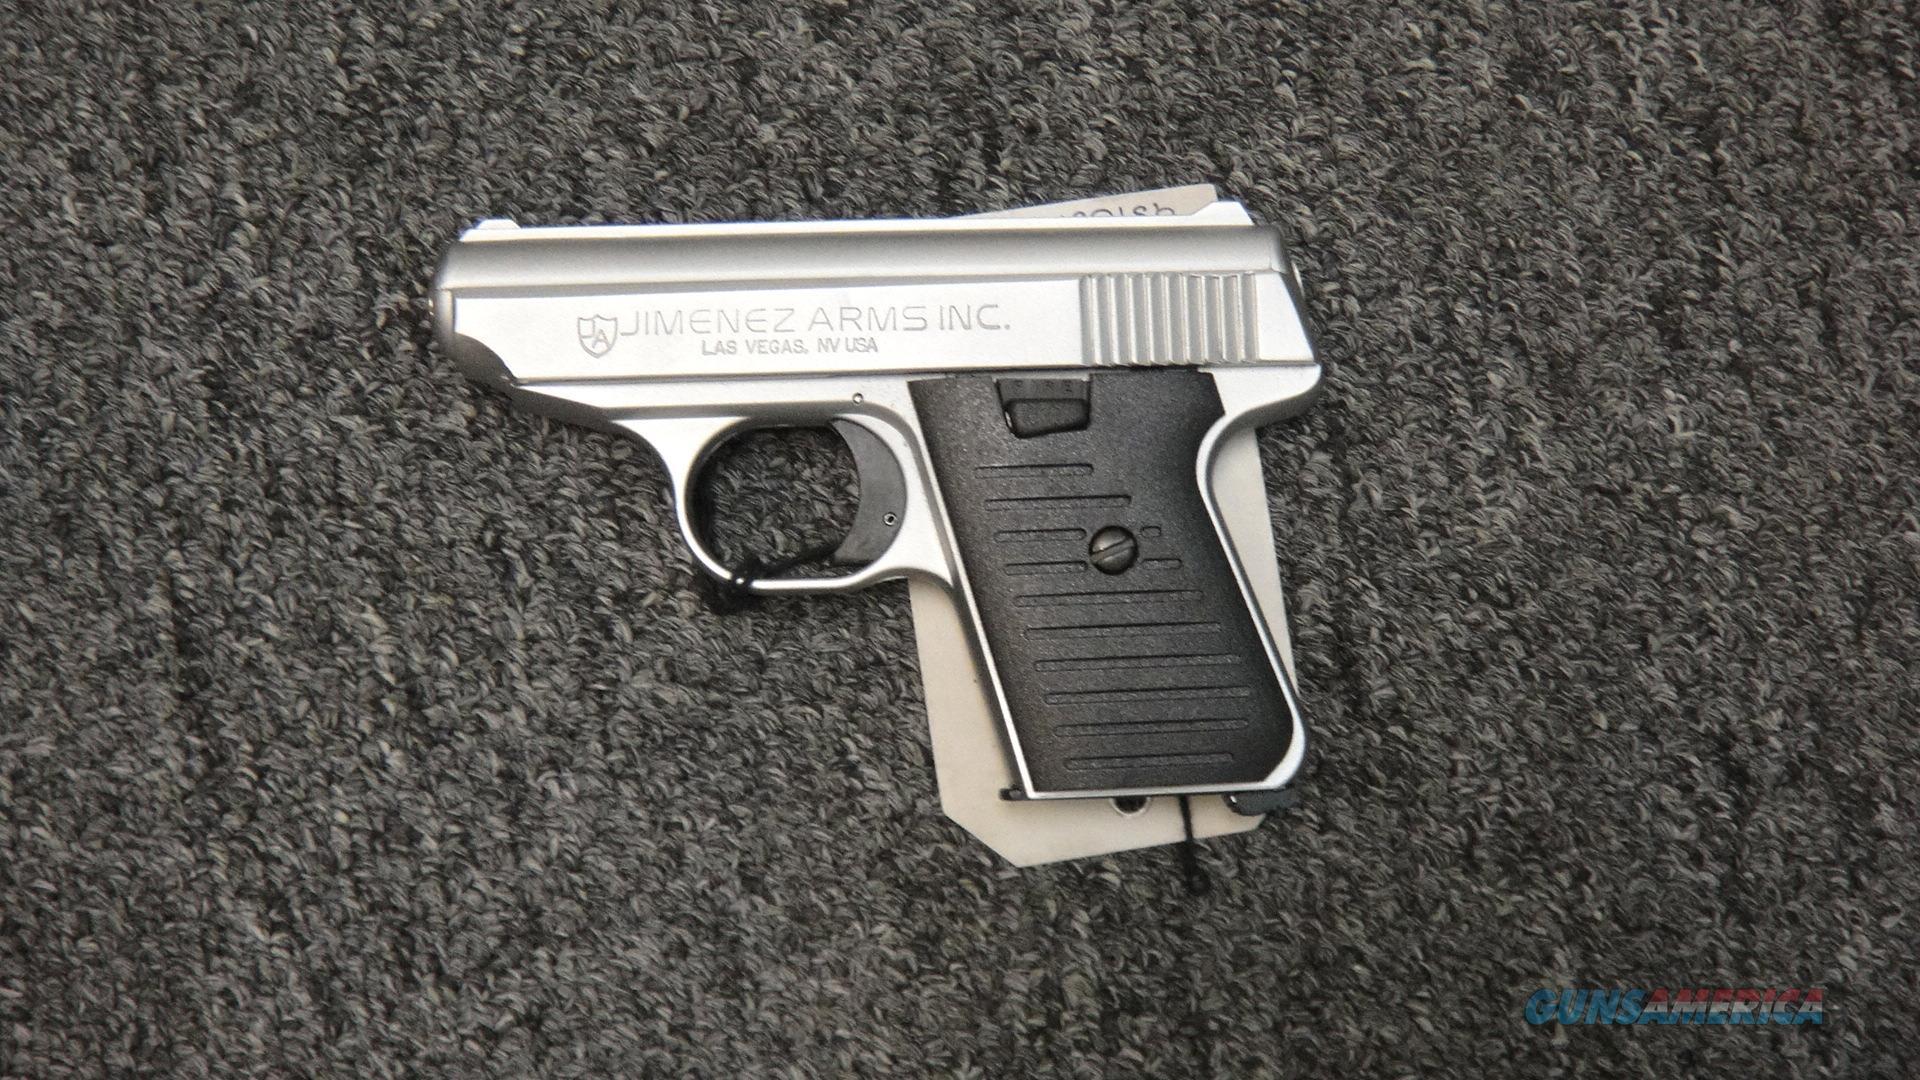 Jiminez Arms JA25 .25ACP  Guns > Pistols > Jimenez Arms- J.A. Pistols